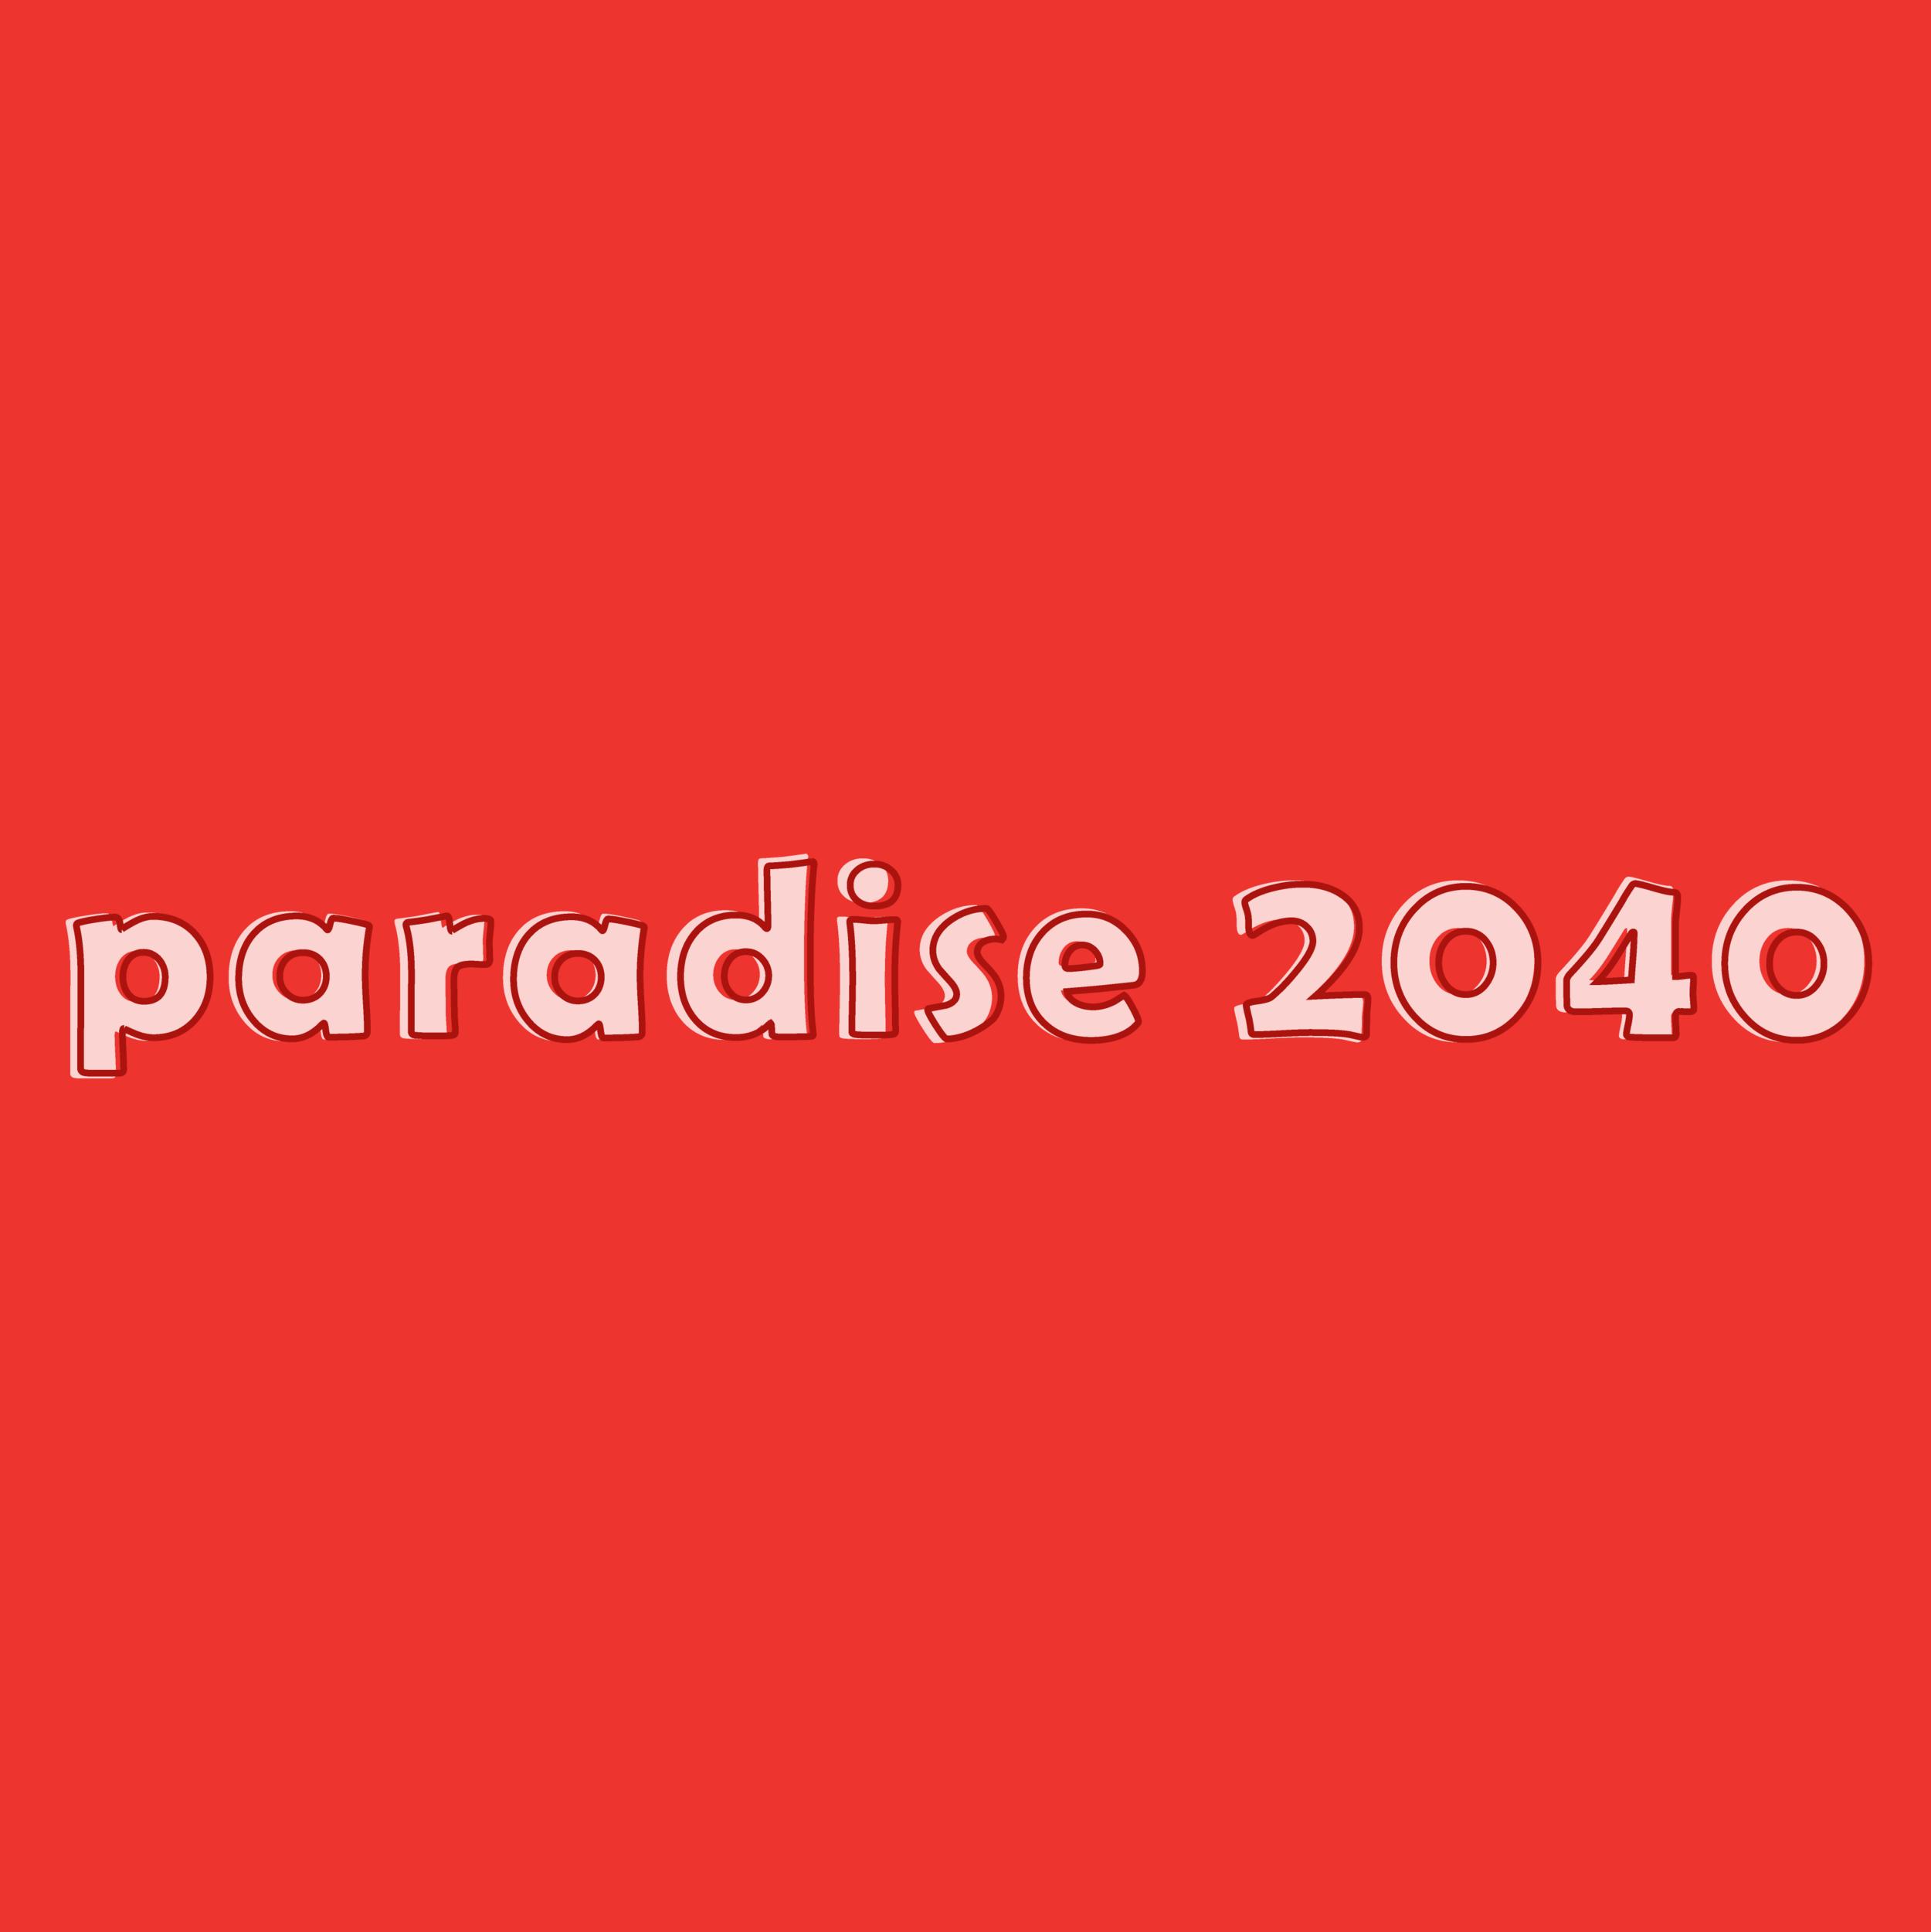 paradise 2040